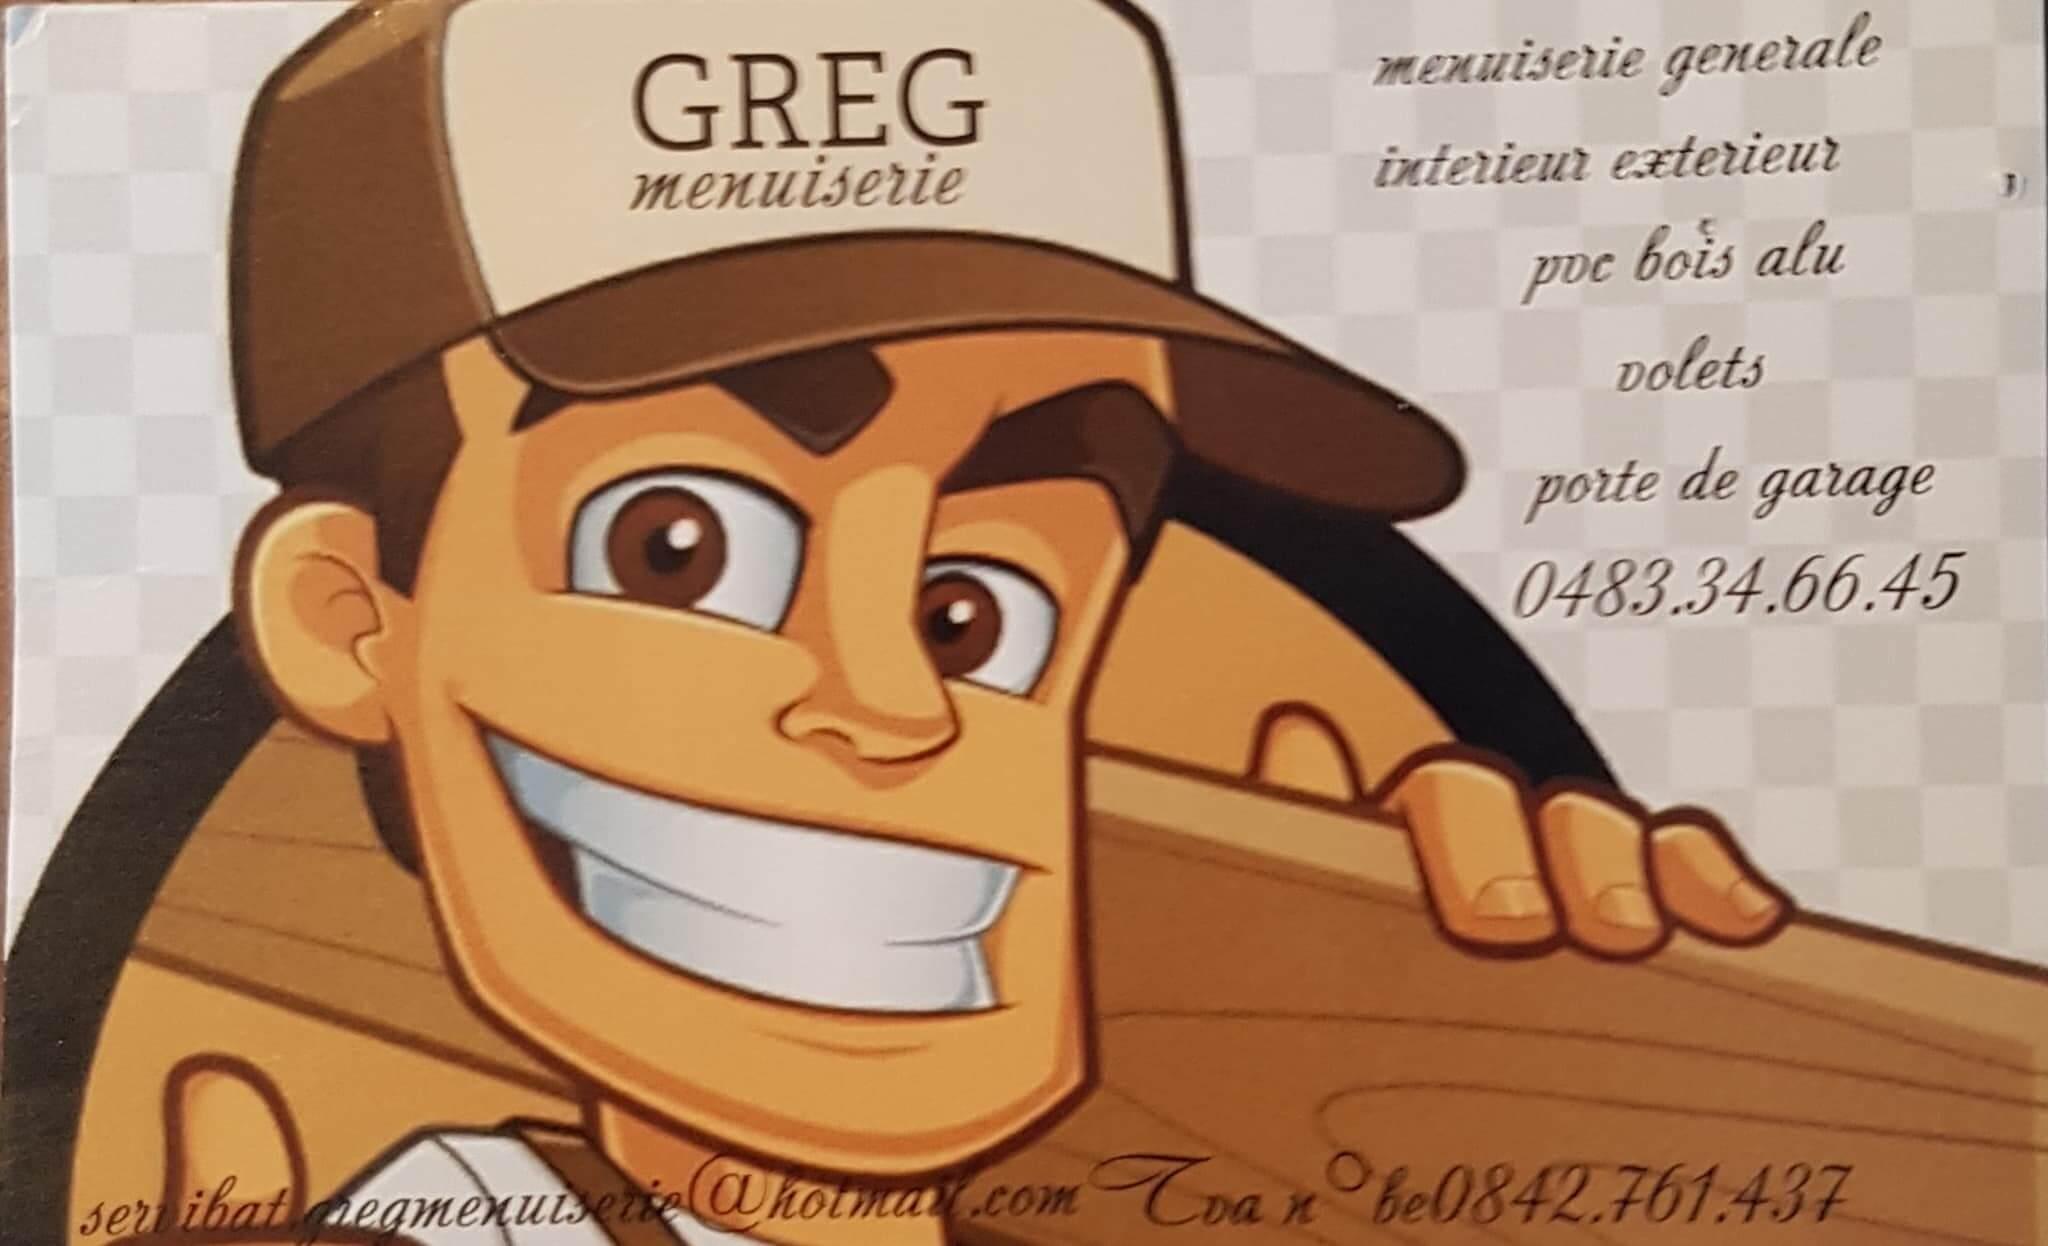 GREG menuiserie